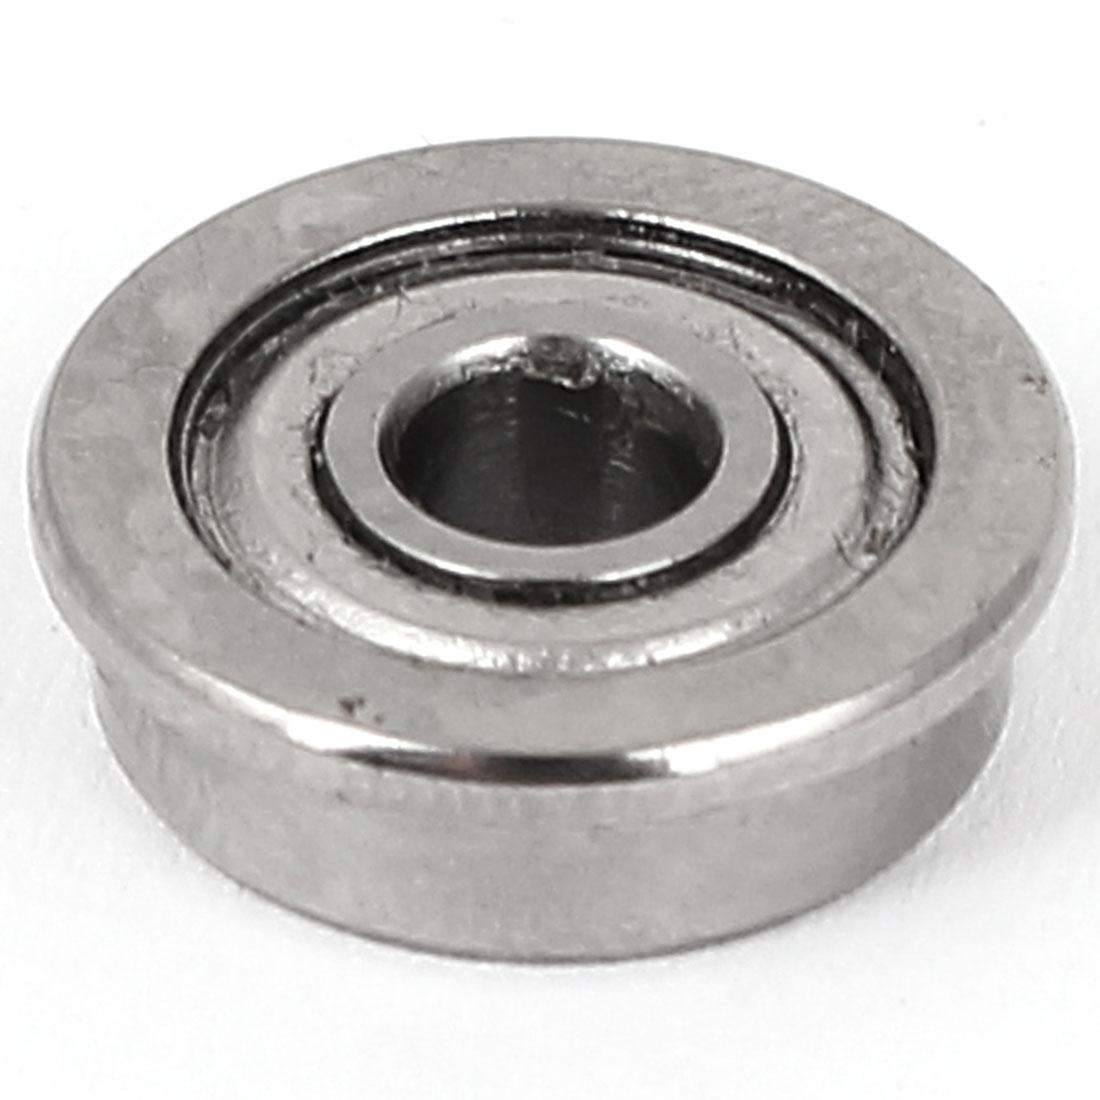 4mm x 15mm x 5mm Metal Flanged Ball Bearing F624ZZ Silver Tone